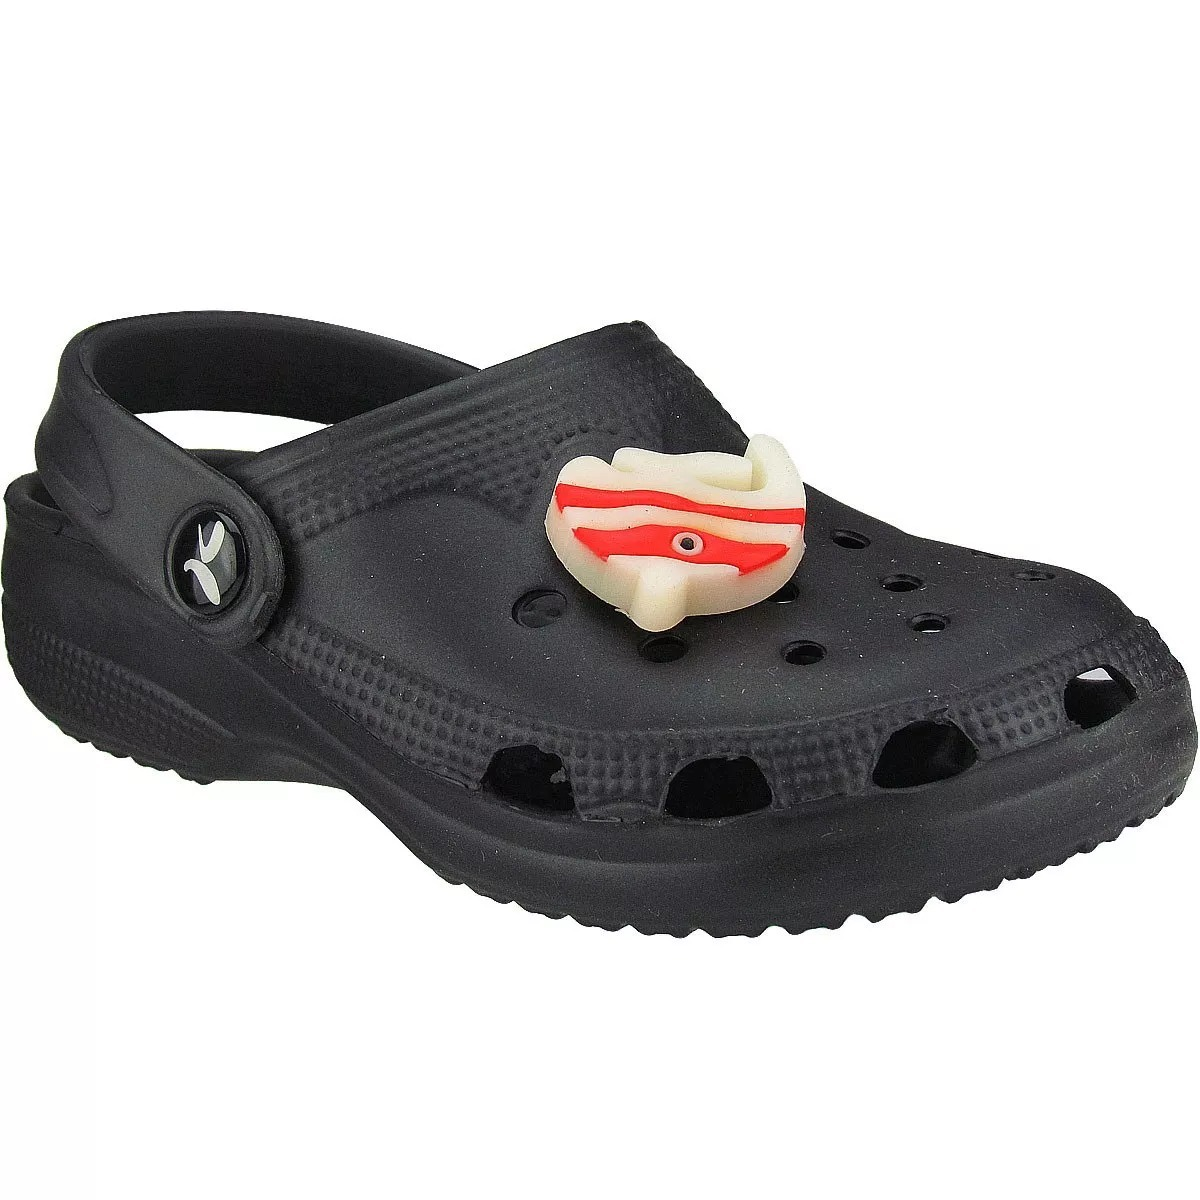 63e833c1032 crocs sandalia kemo infantil b 10 01 menino  menina. Carregando zoom.